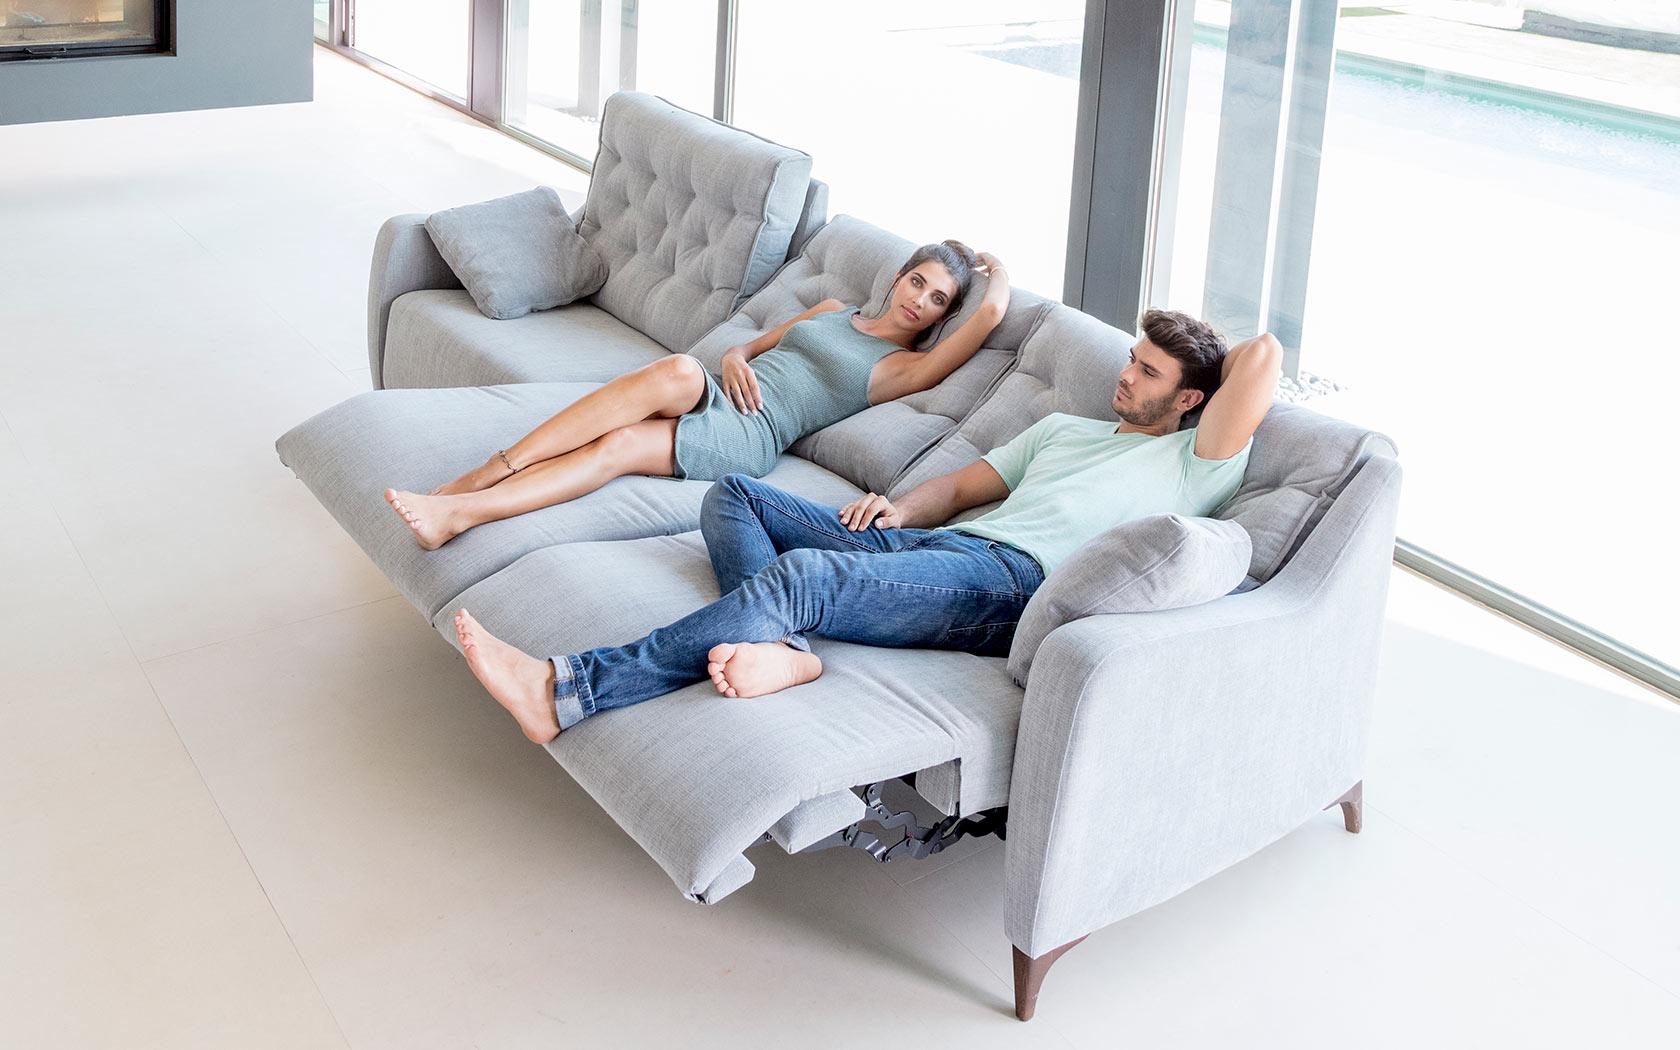 Avalon sofa relax 2019 05